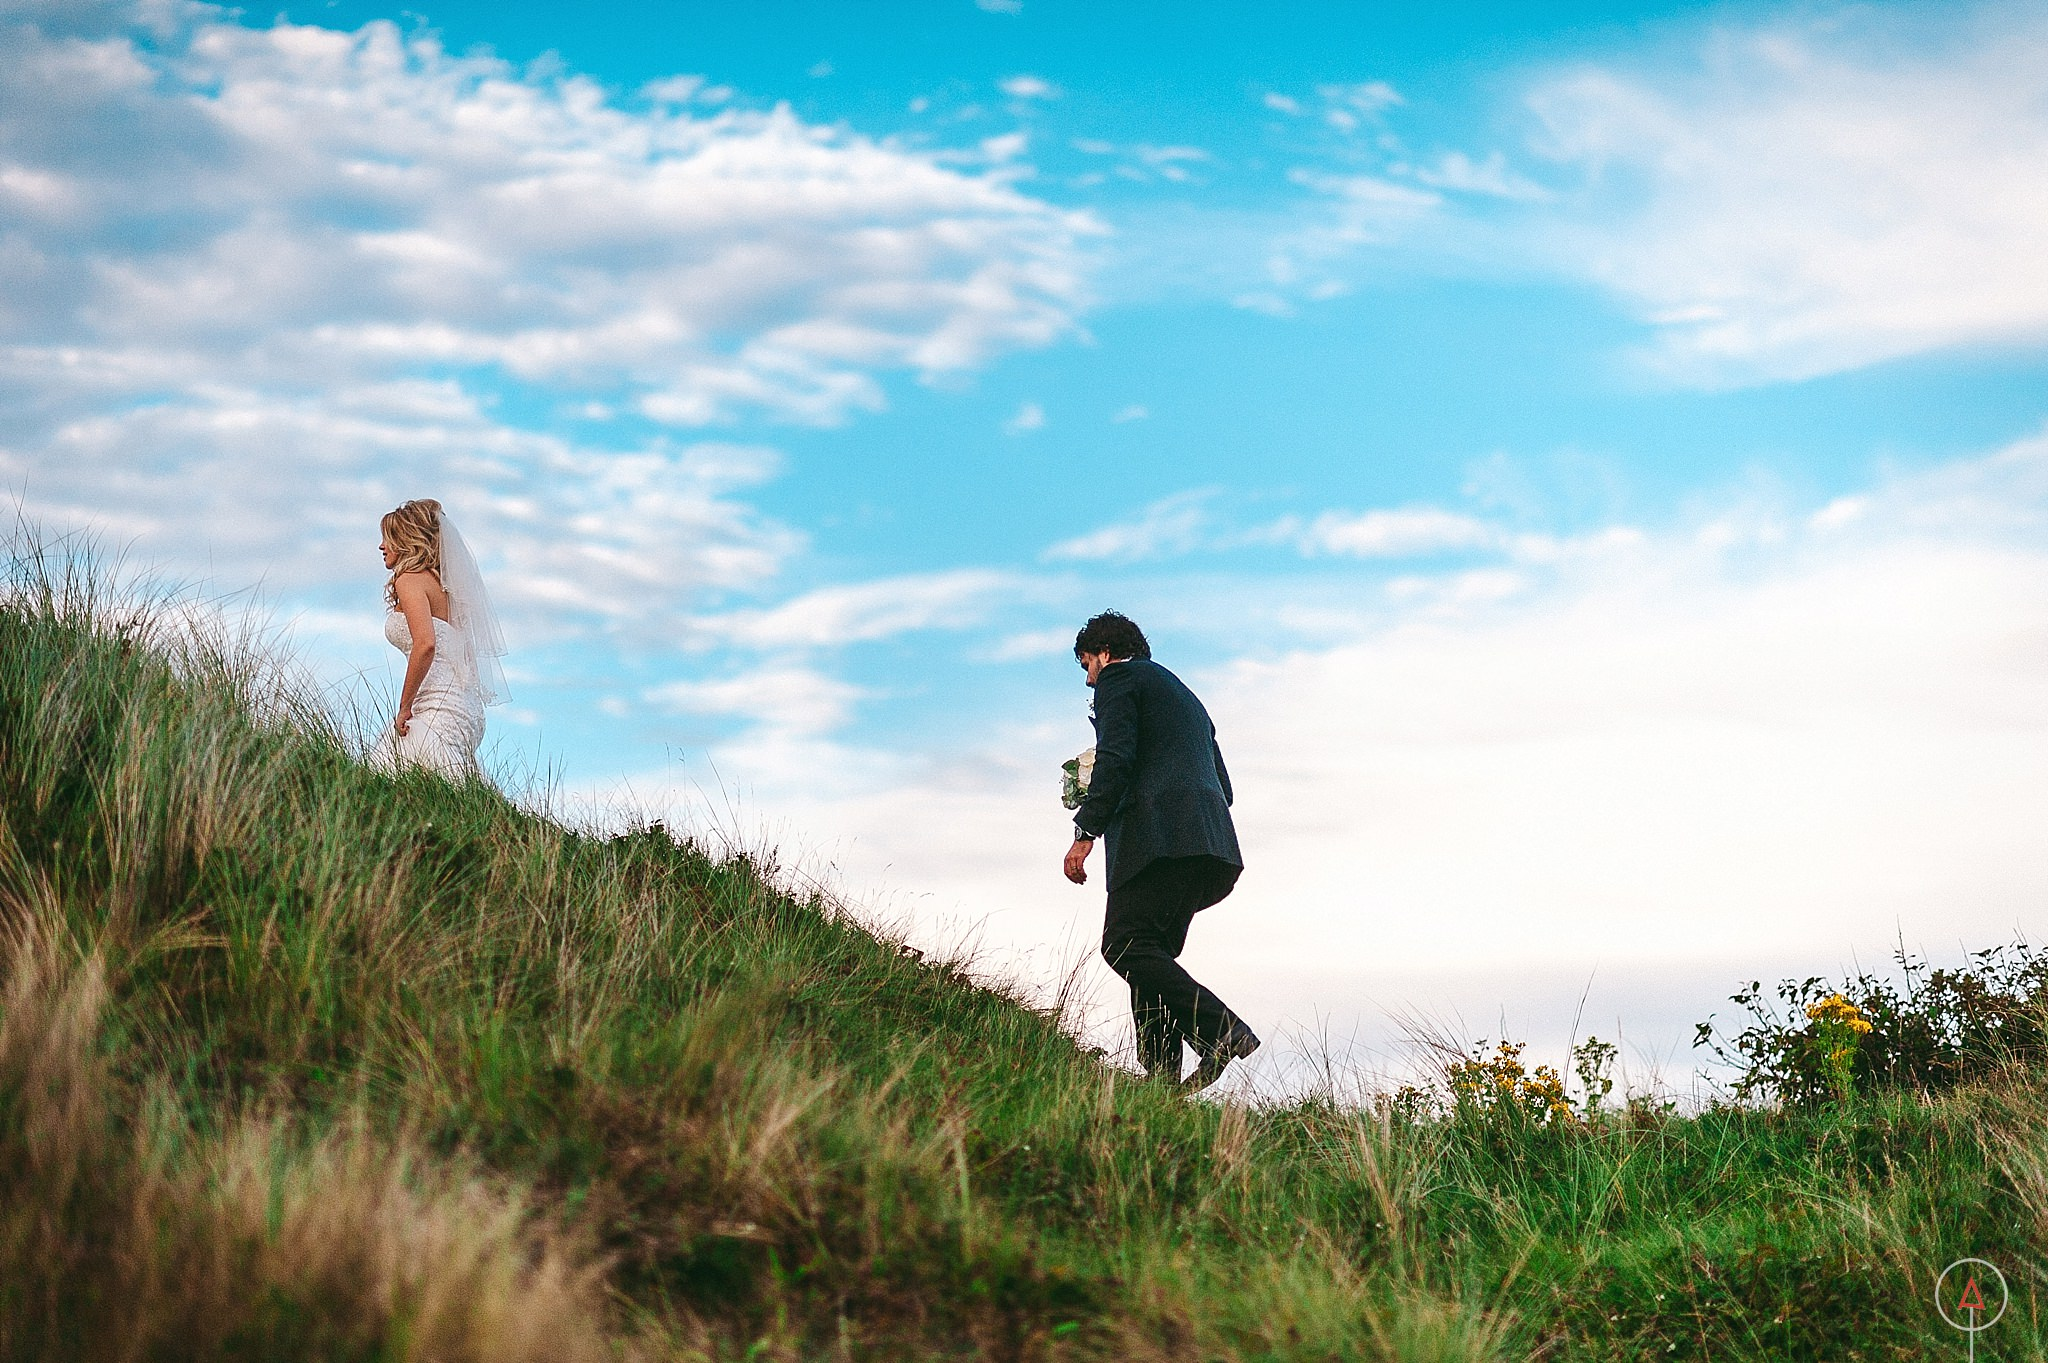 cardiff-wedding-photographer-aga-tomaszek_0404